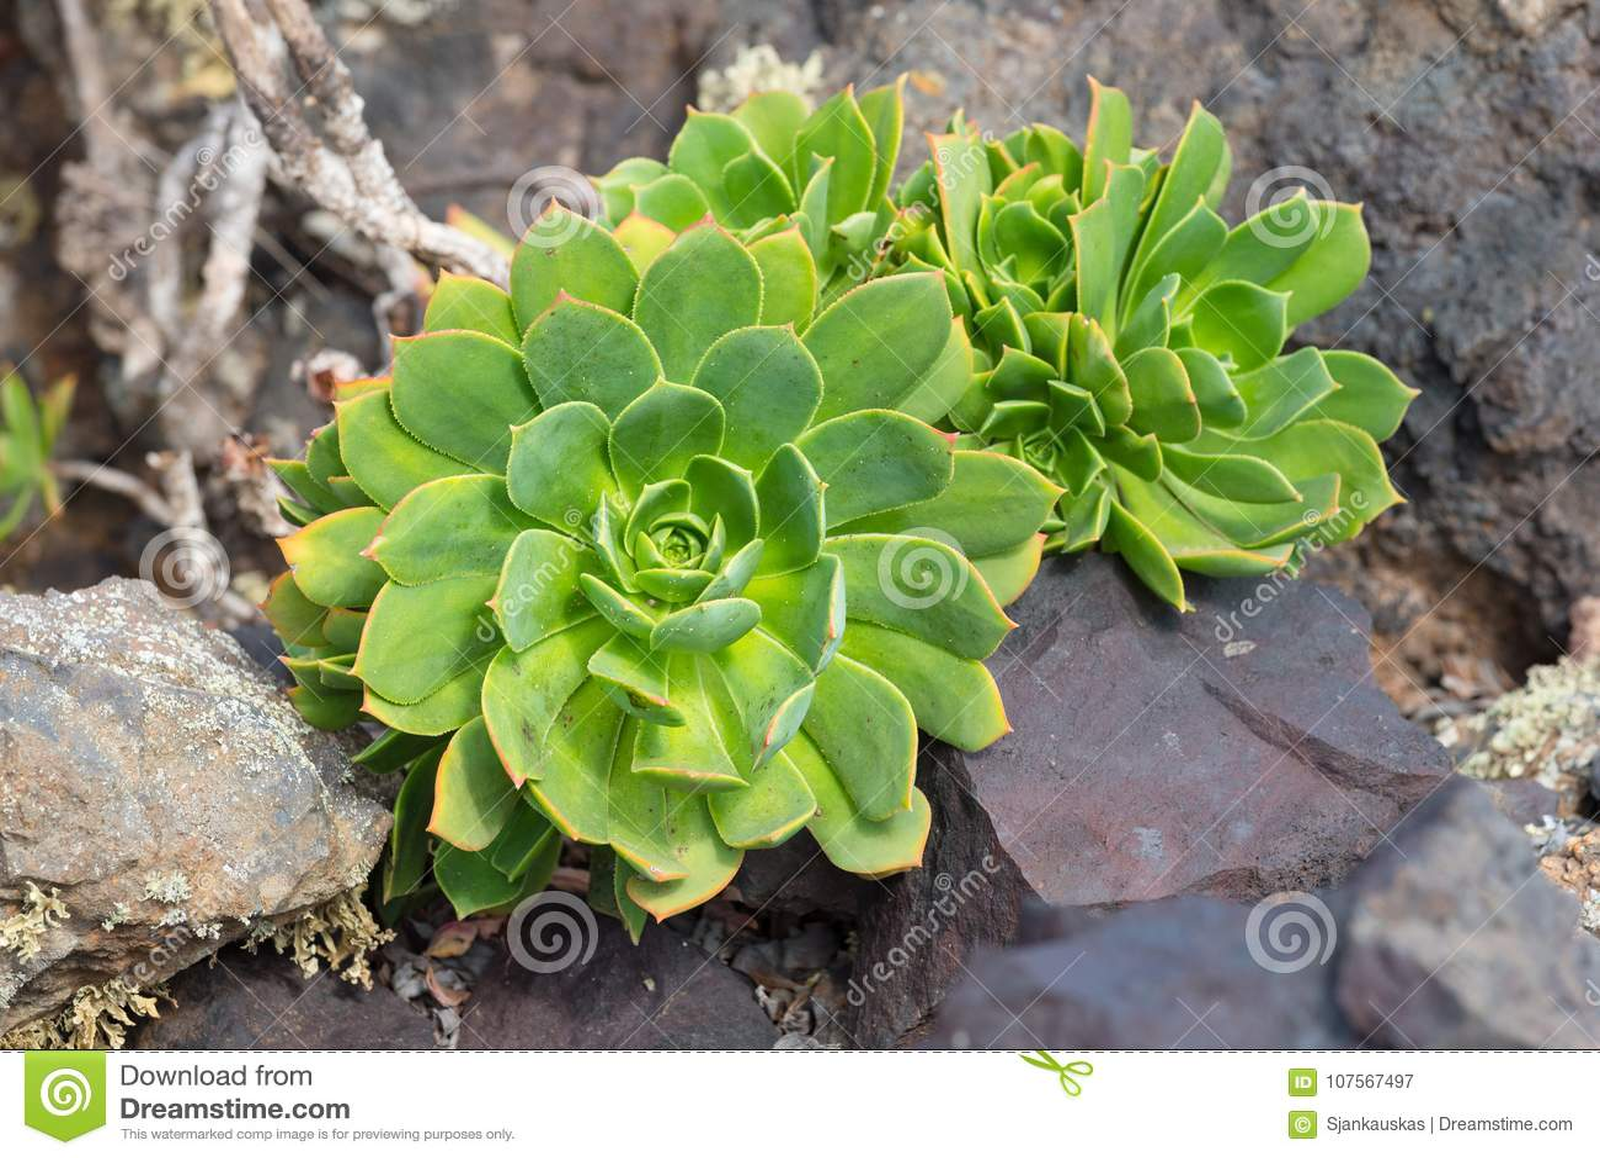 Giganta Houseleek Aeonium lancerottense tłustoszowata roślina